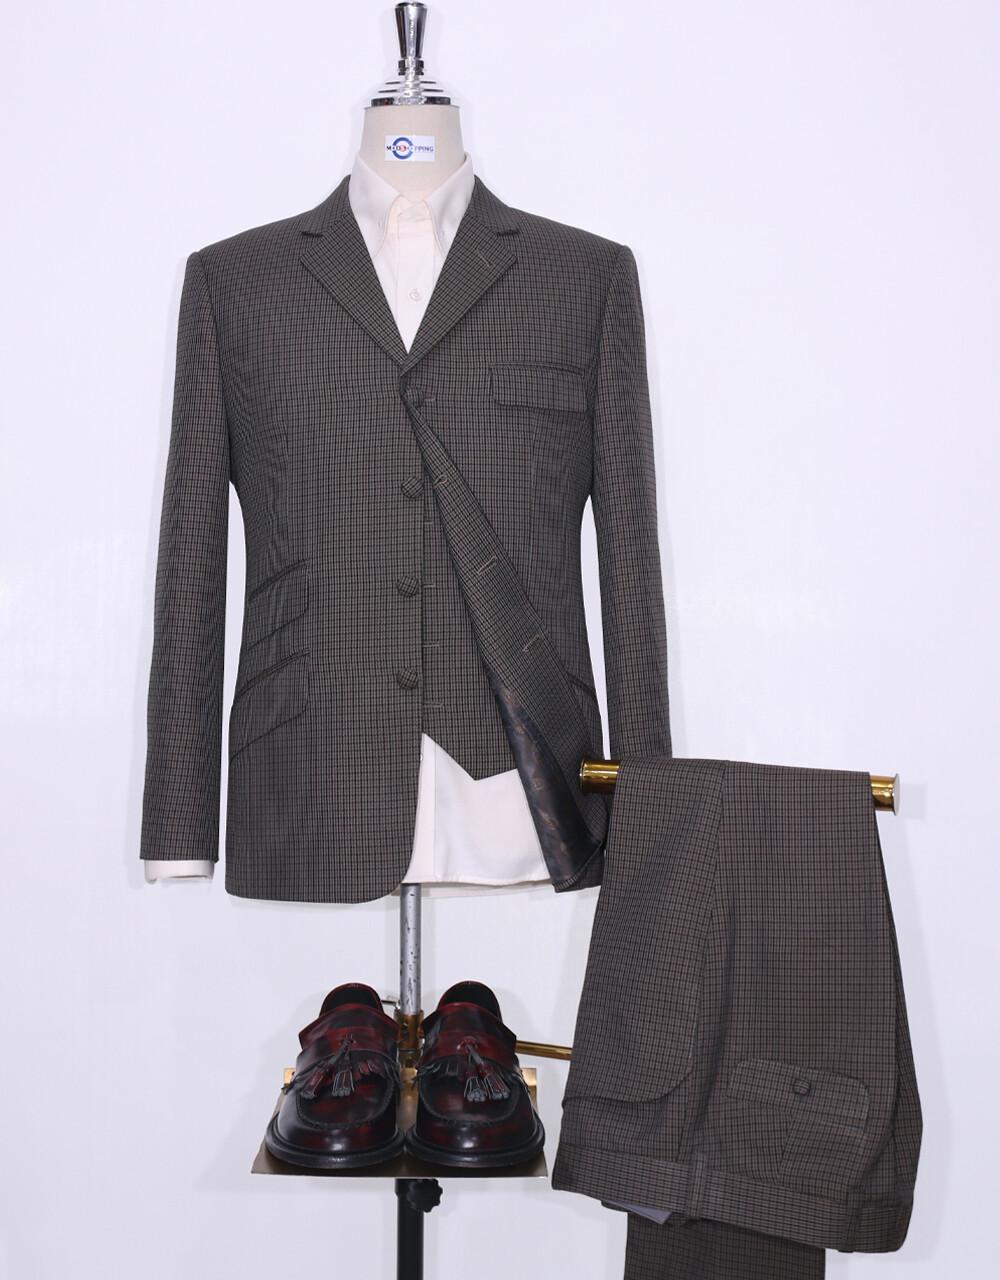 3 Piece Suit | Dark Brown And Black Houndstooth Suit